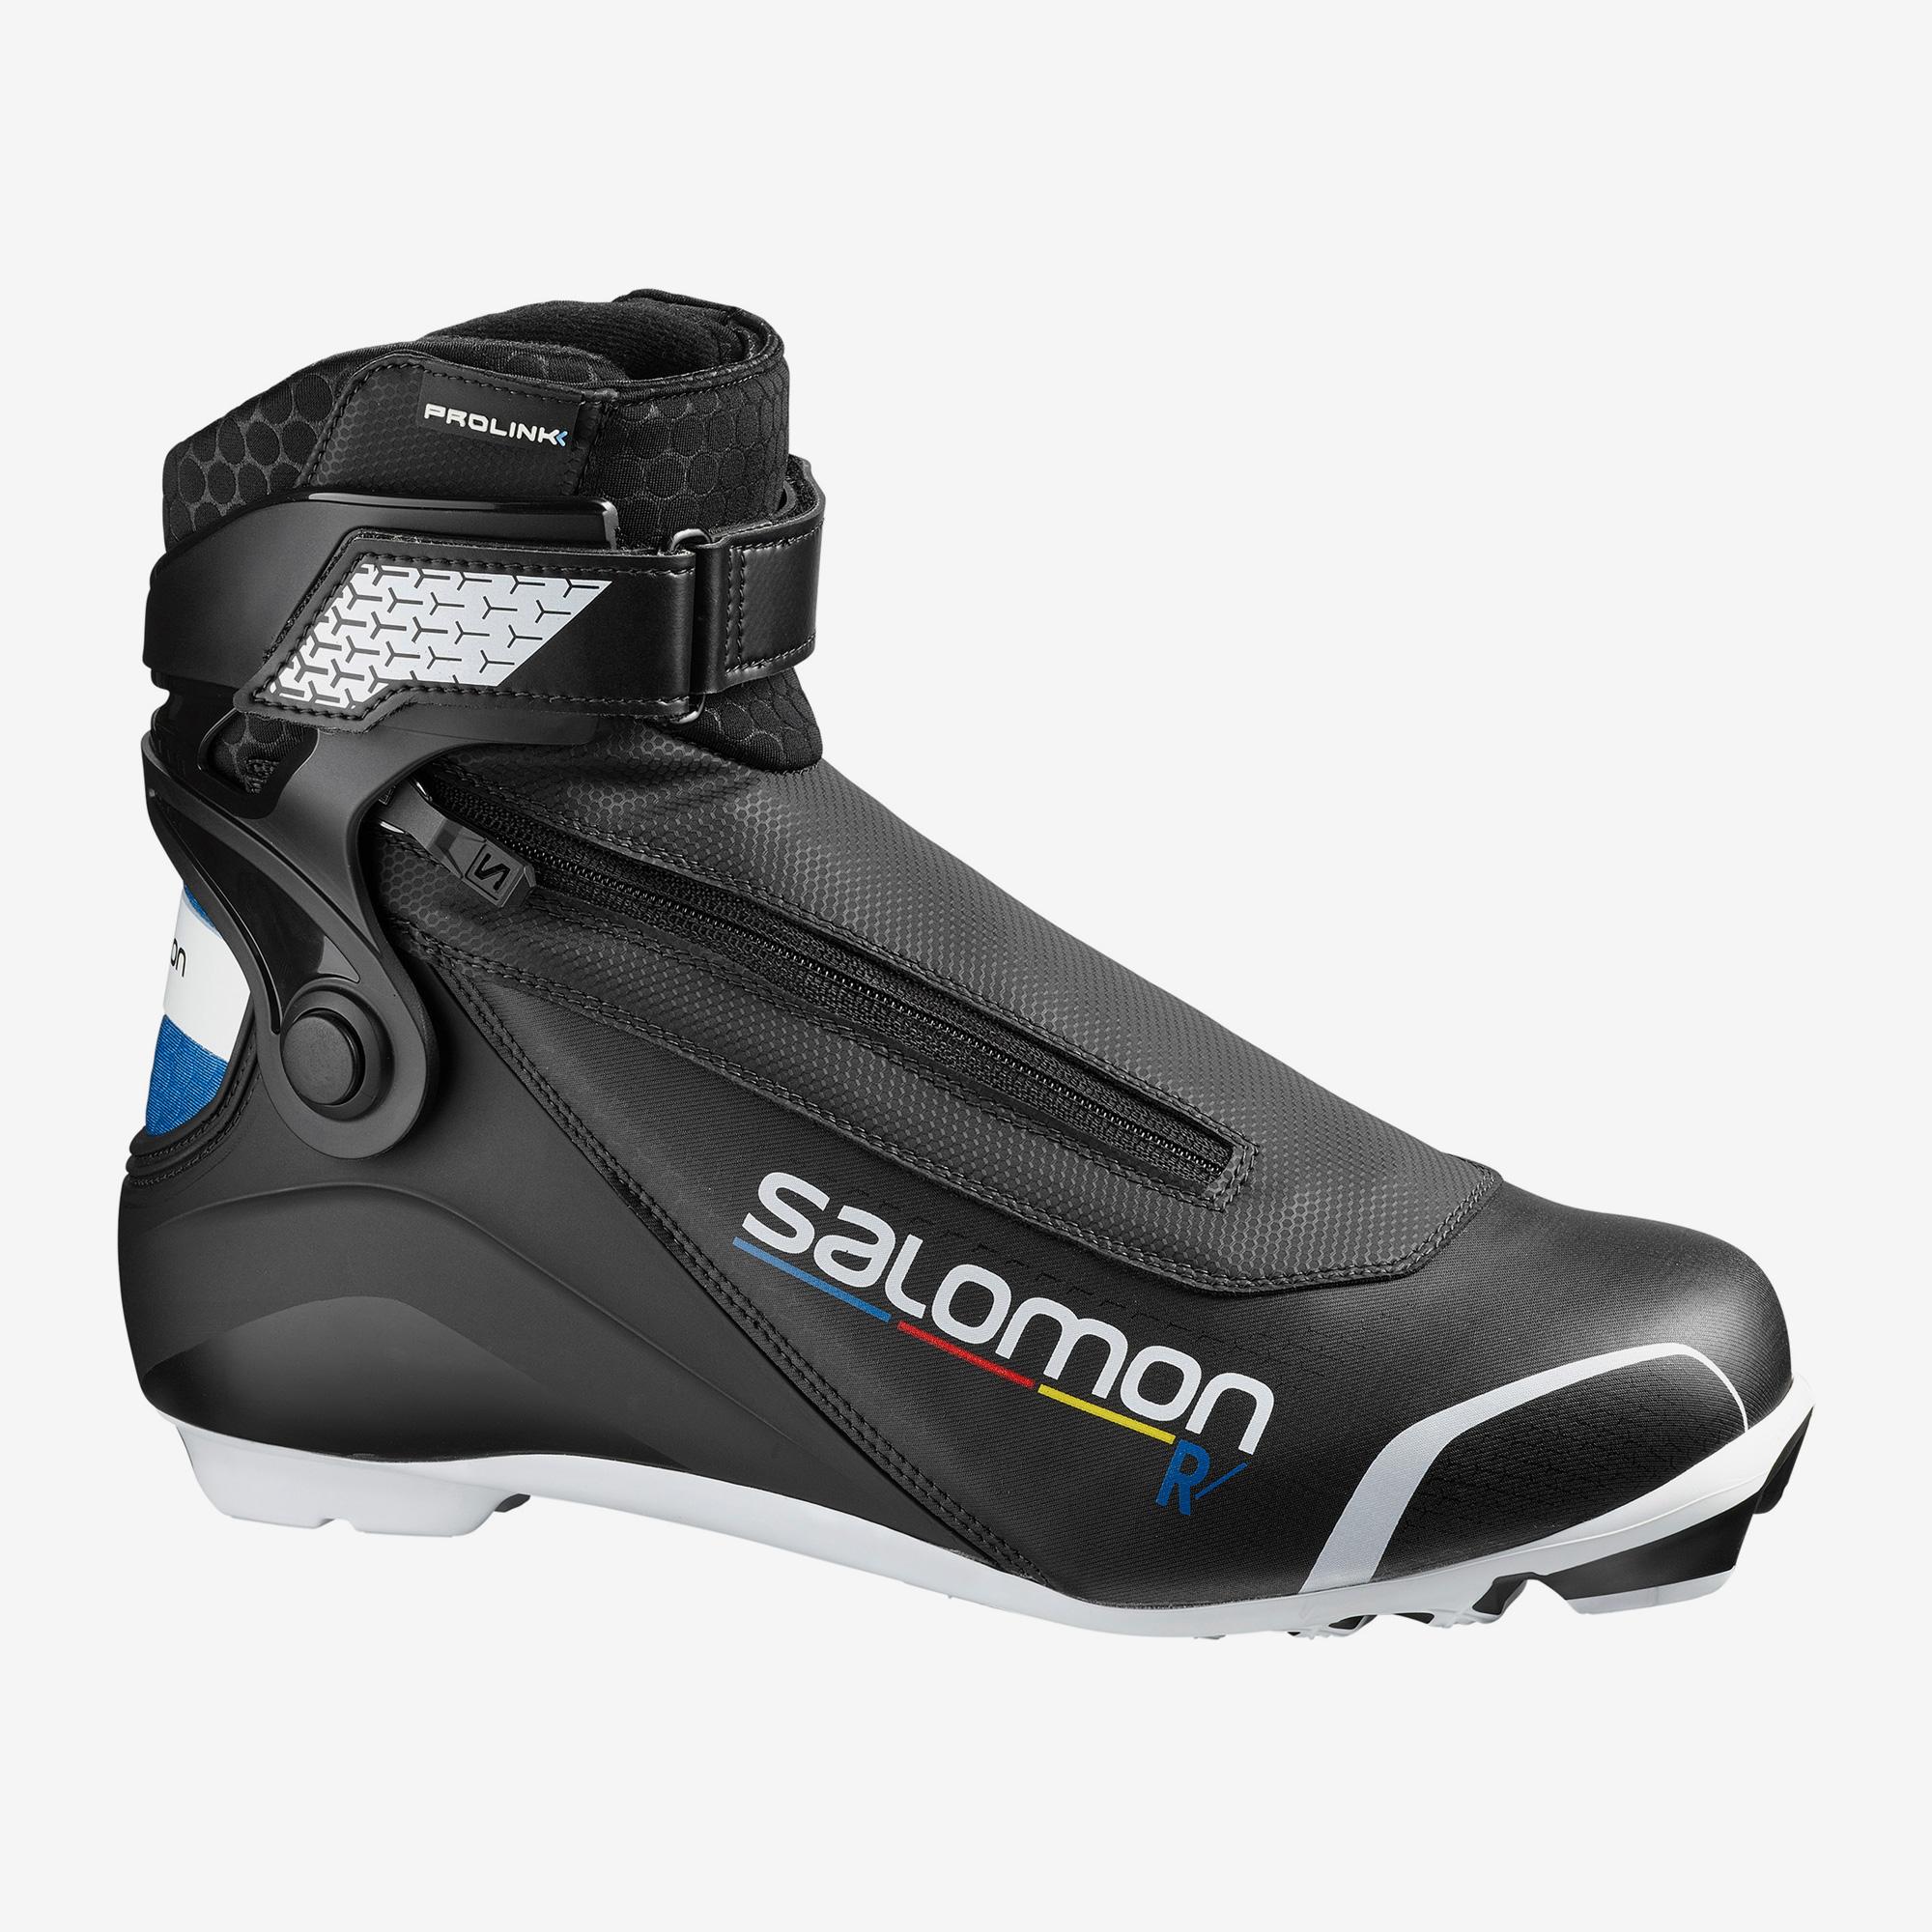 Salomon R/PROLINK SKATE Langlaufschuh